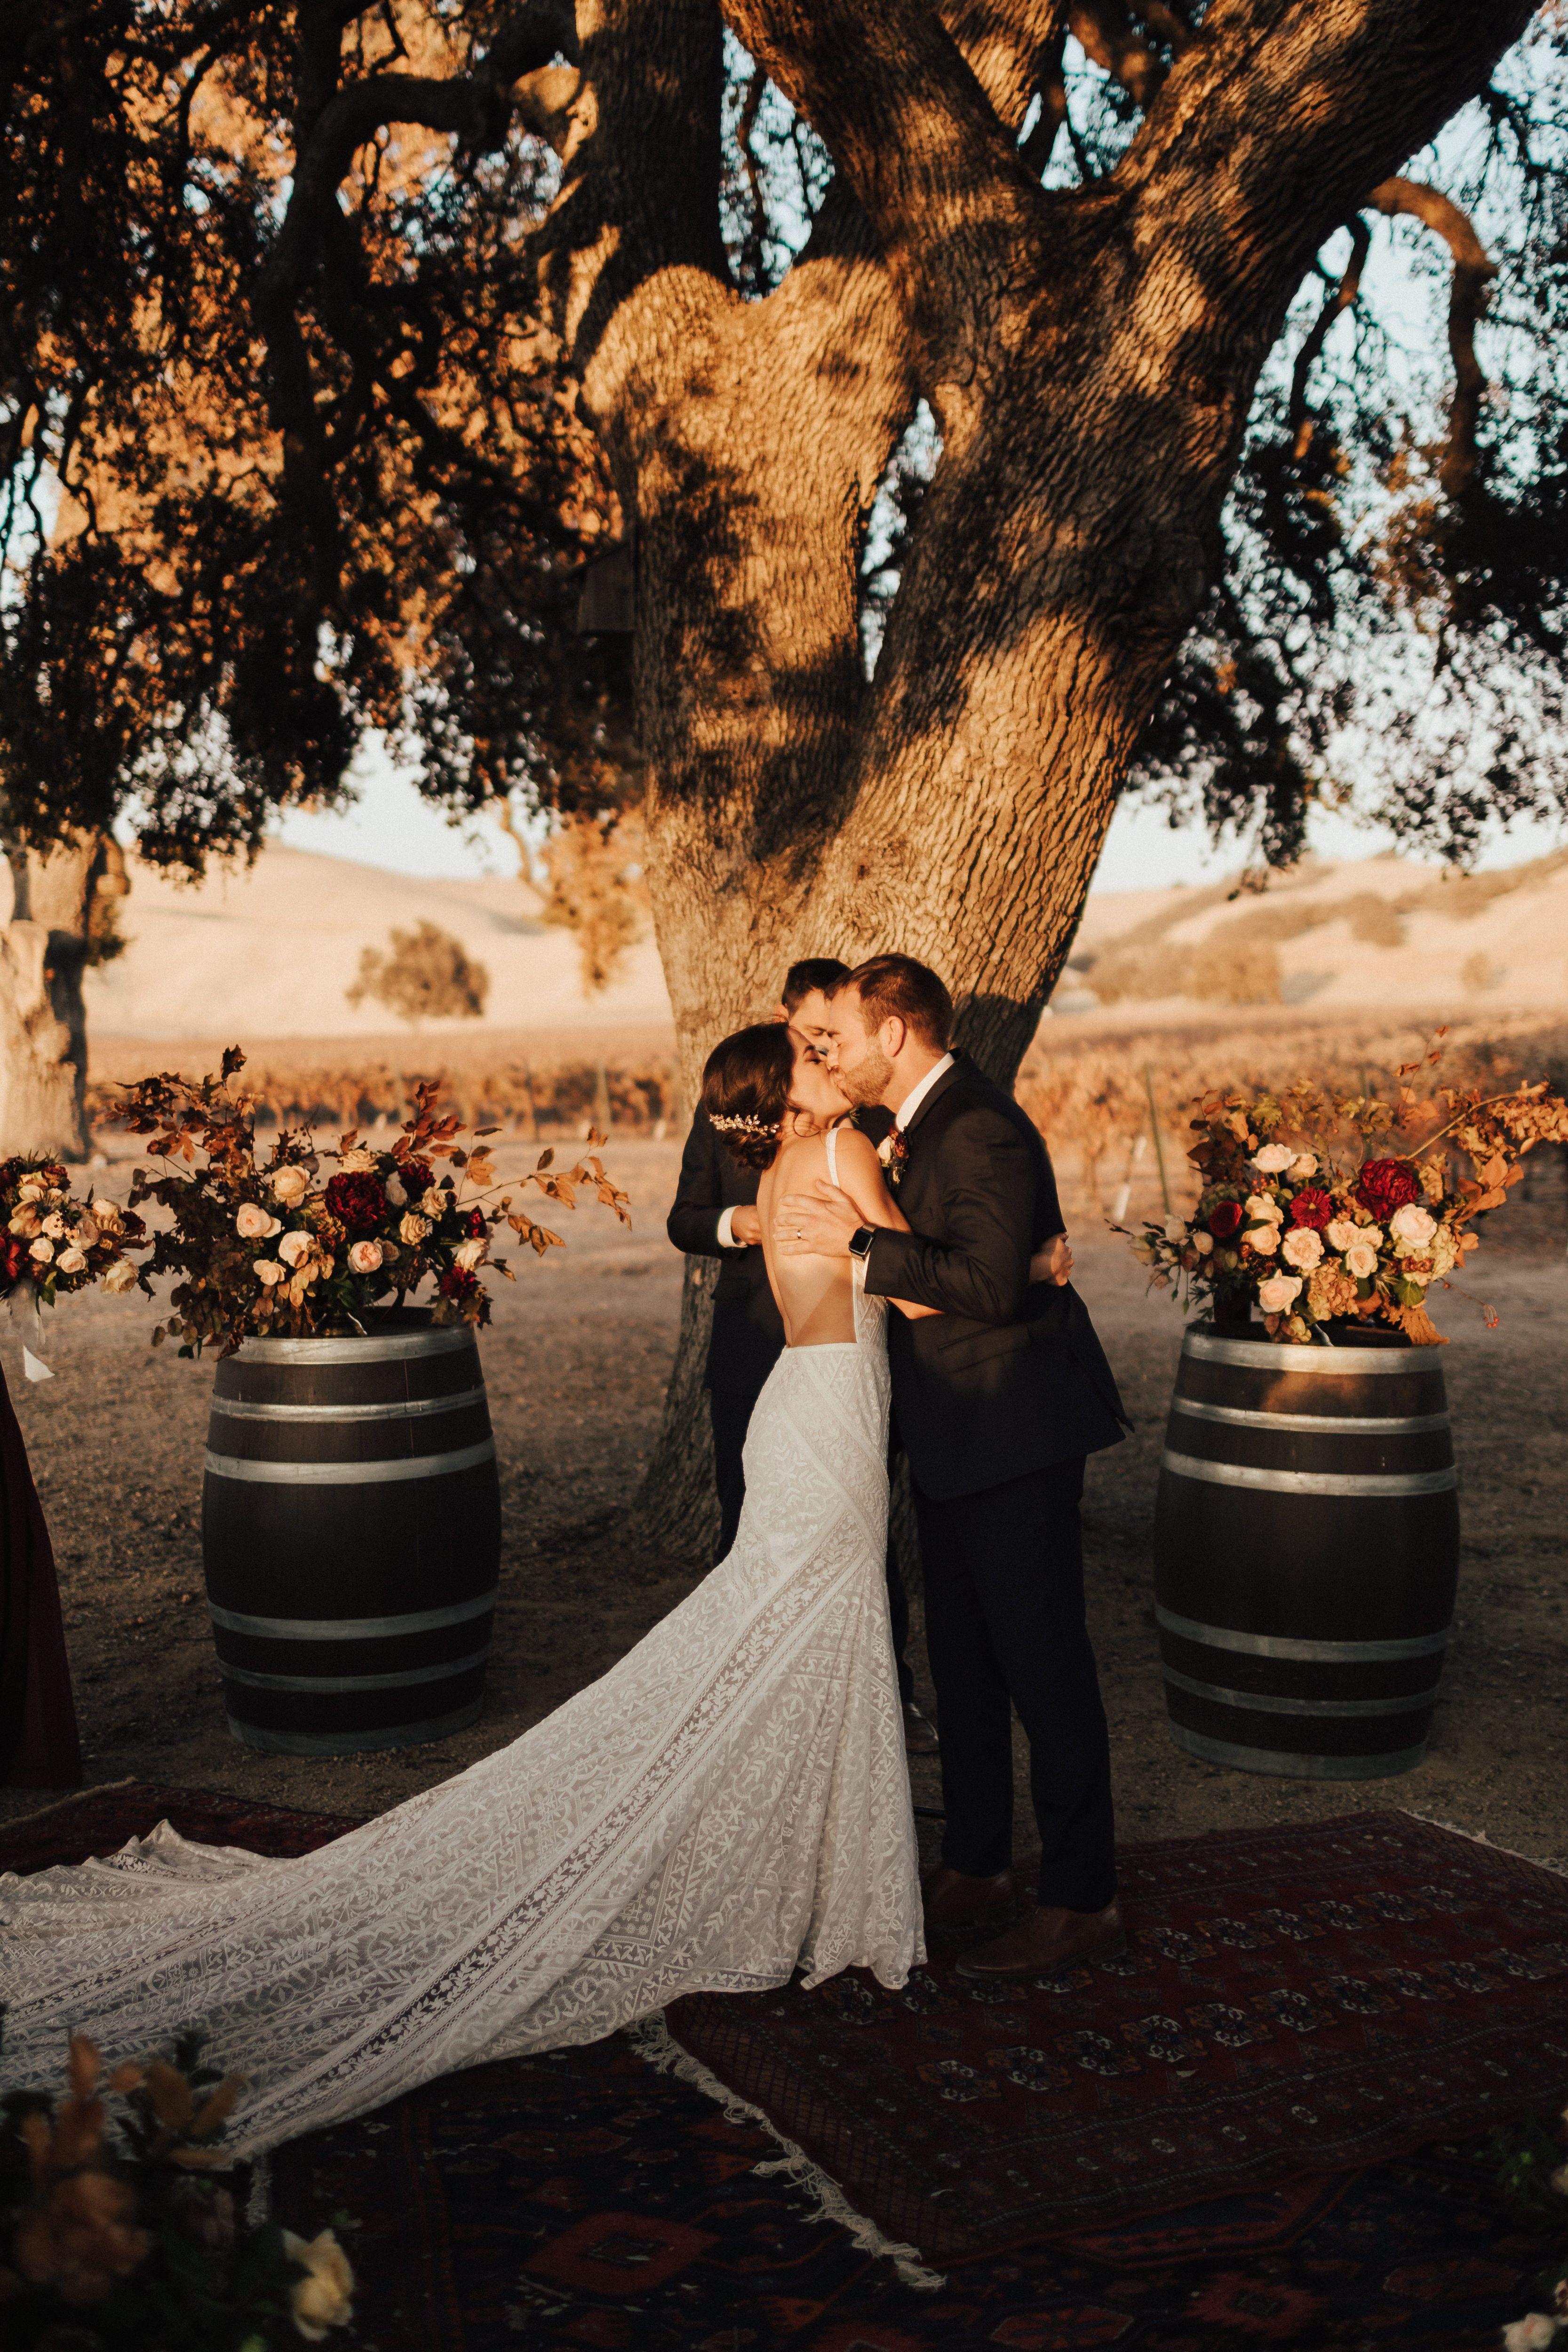 Boho Mermaid Wedding Dress Fall Vineyard Wedding Moody Wedding Photography Fall Wedding Photography Fall Wedding Photos [ 5000 x 3333 Pixel ]